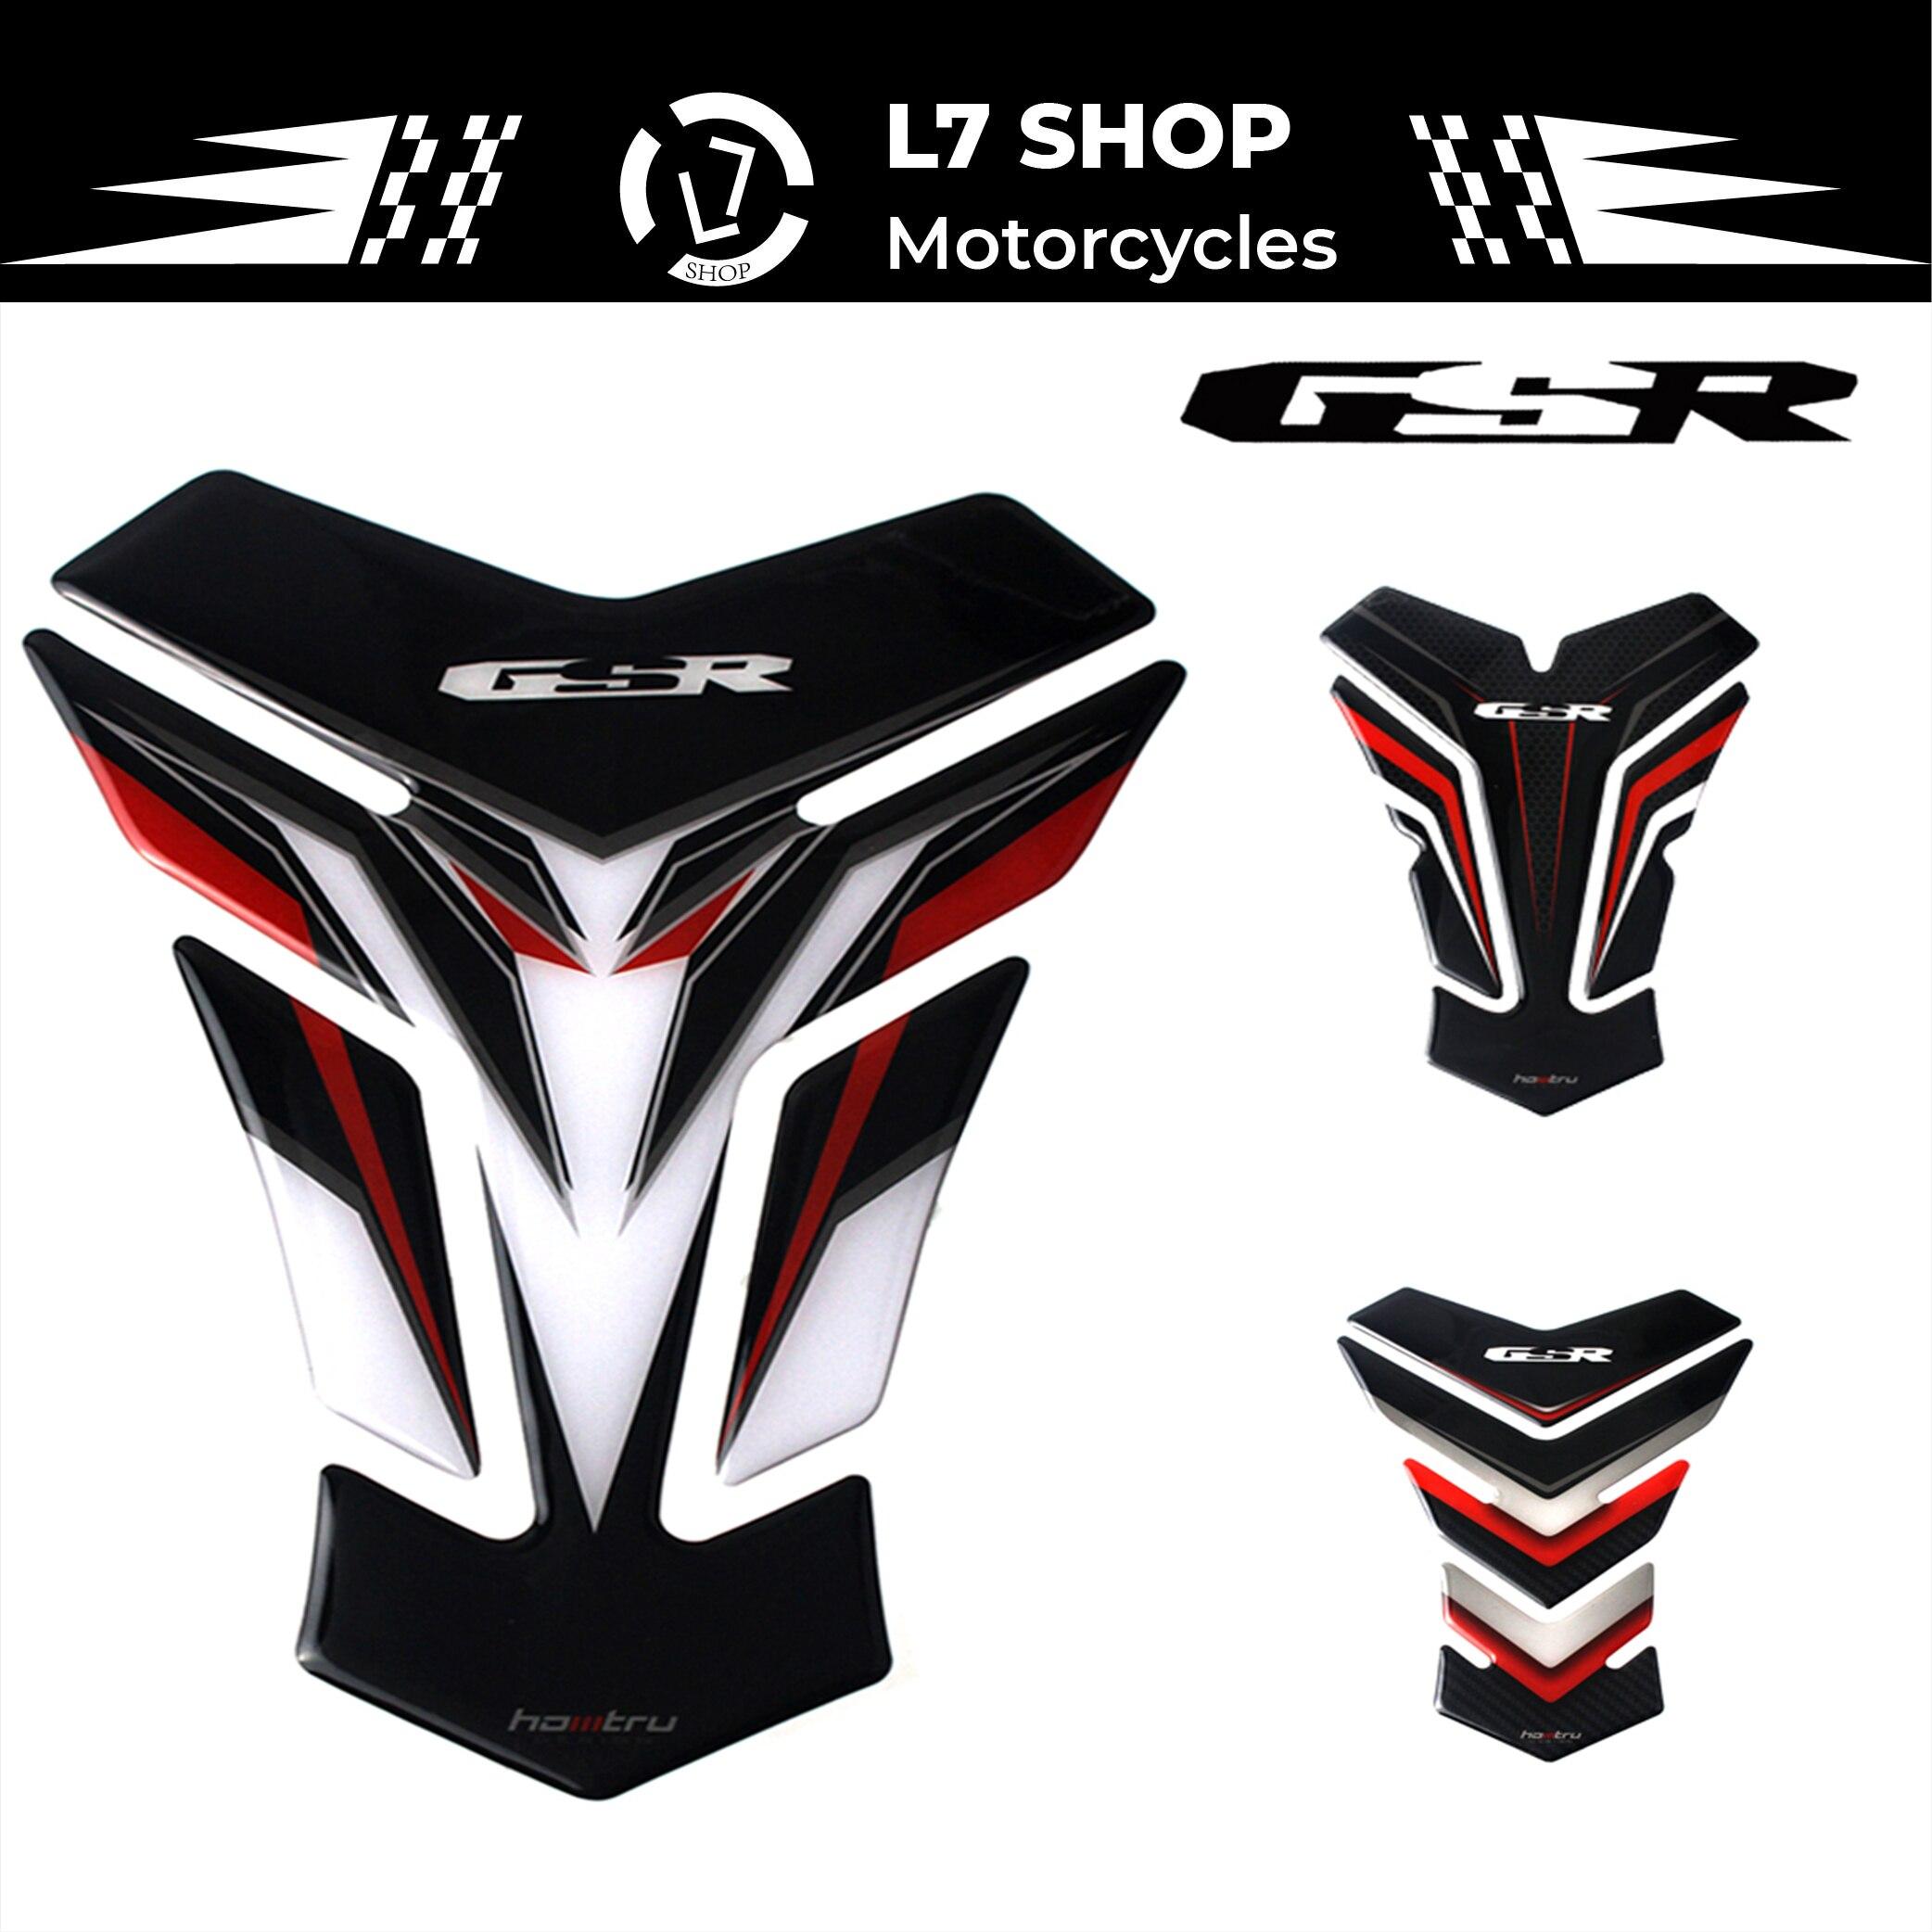 3D защитная накладка на бак мотоцикла Стикеры для Suzuki GSR GSR250 GSR400 GSR600 GSR750